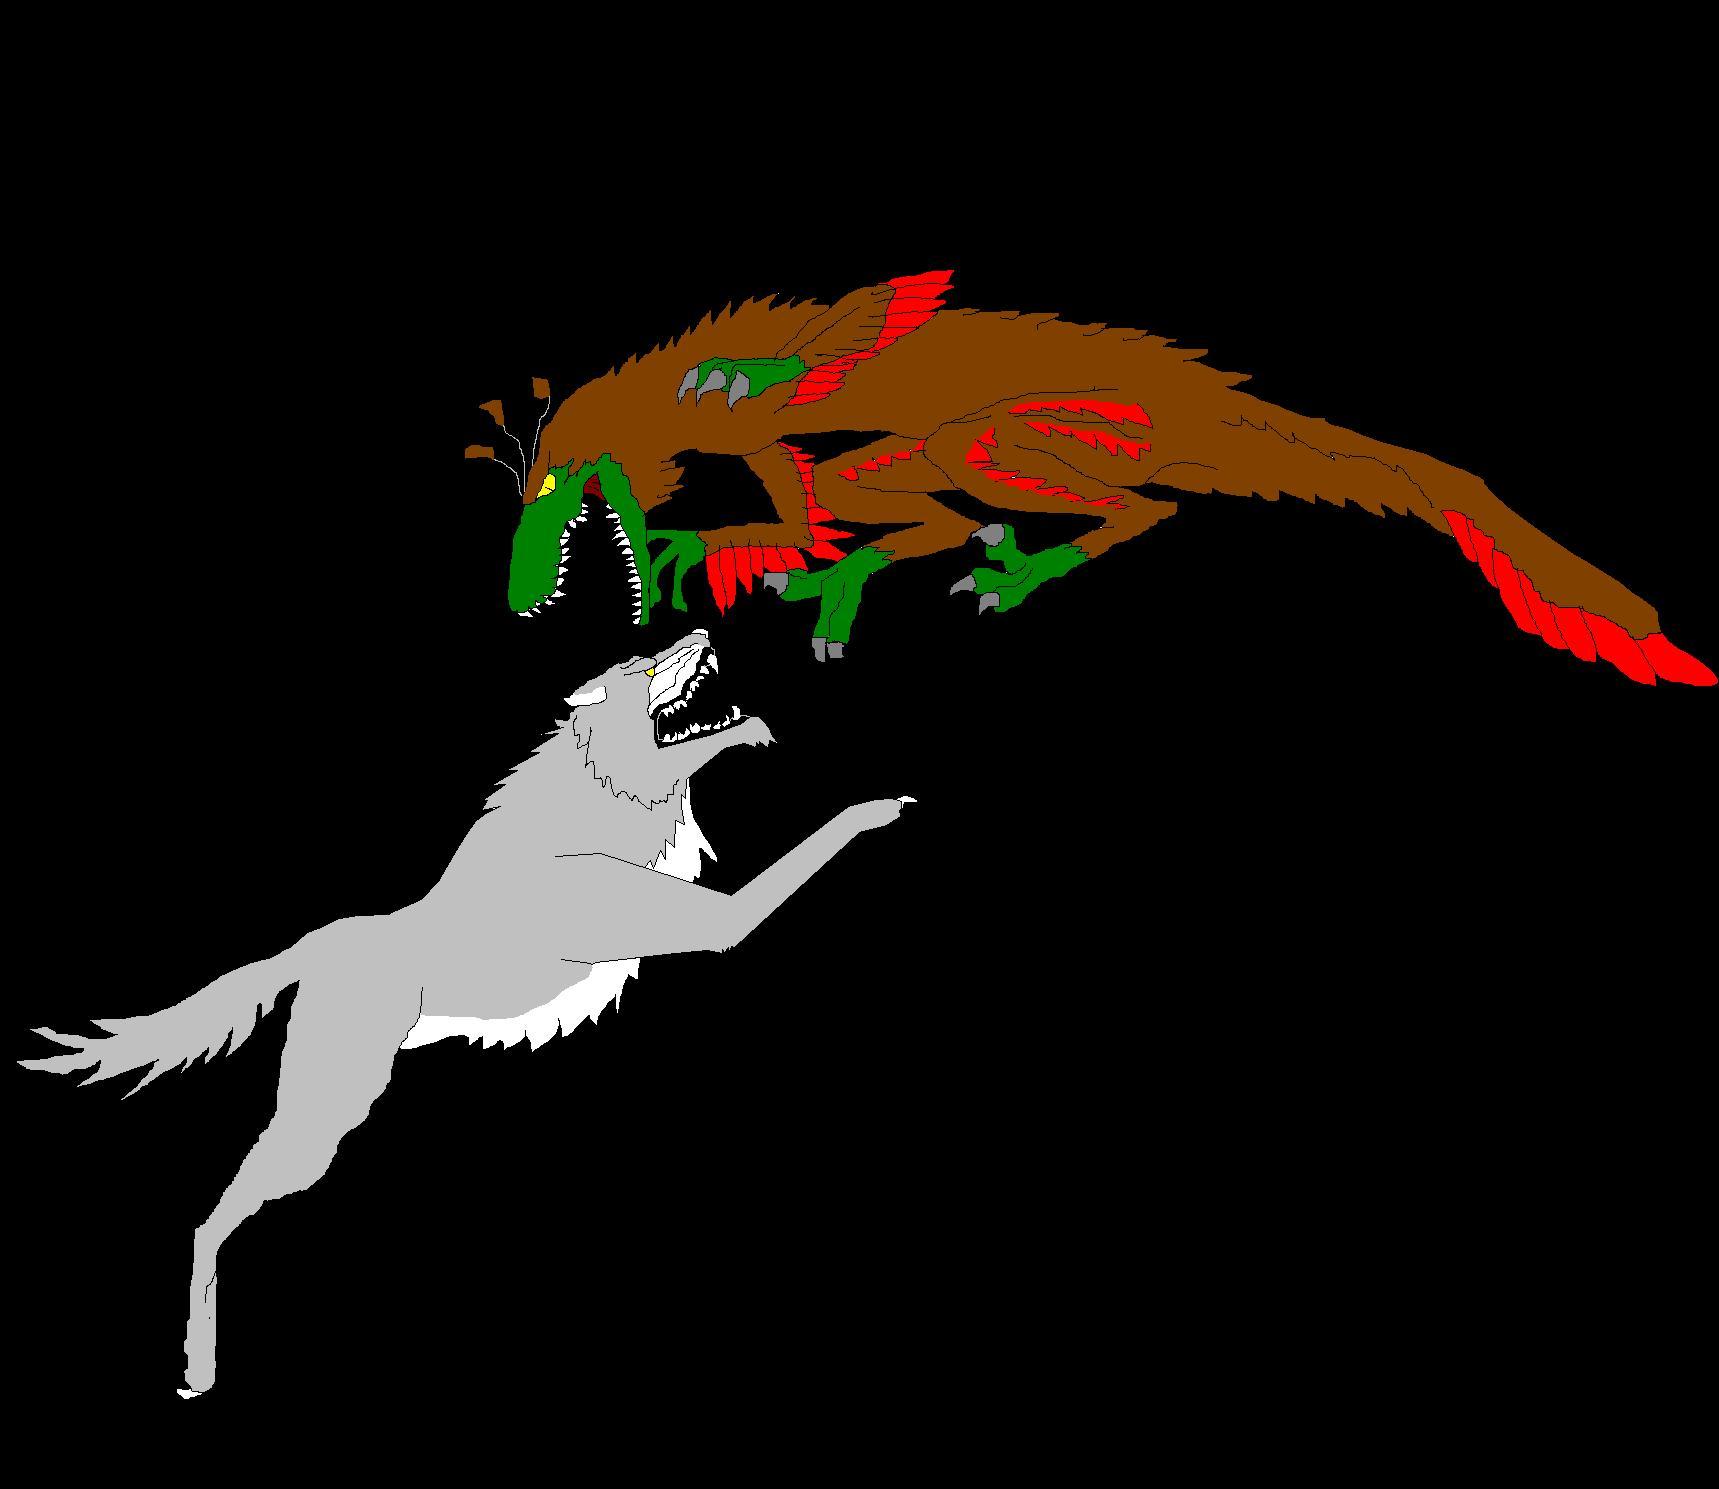 Dire wolf vs wolf - photo#25